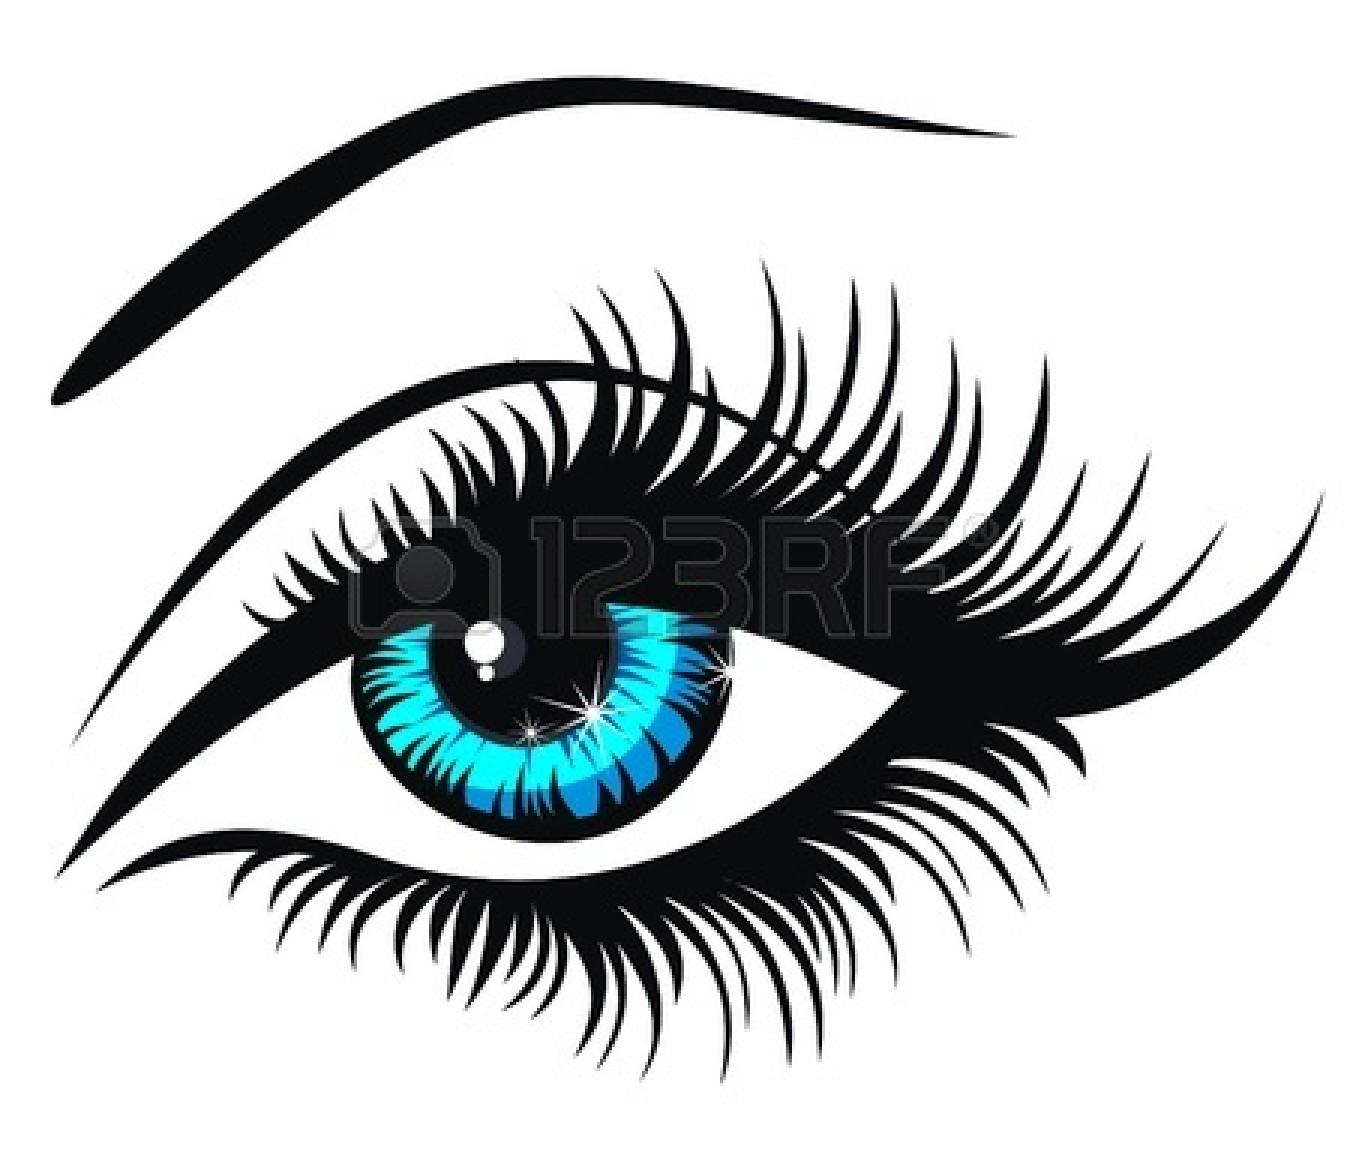 human eye clip art viewing clipart panda free clipart images rh clipartpanda com clip art eyebrows clipart eyeglasses